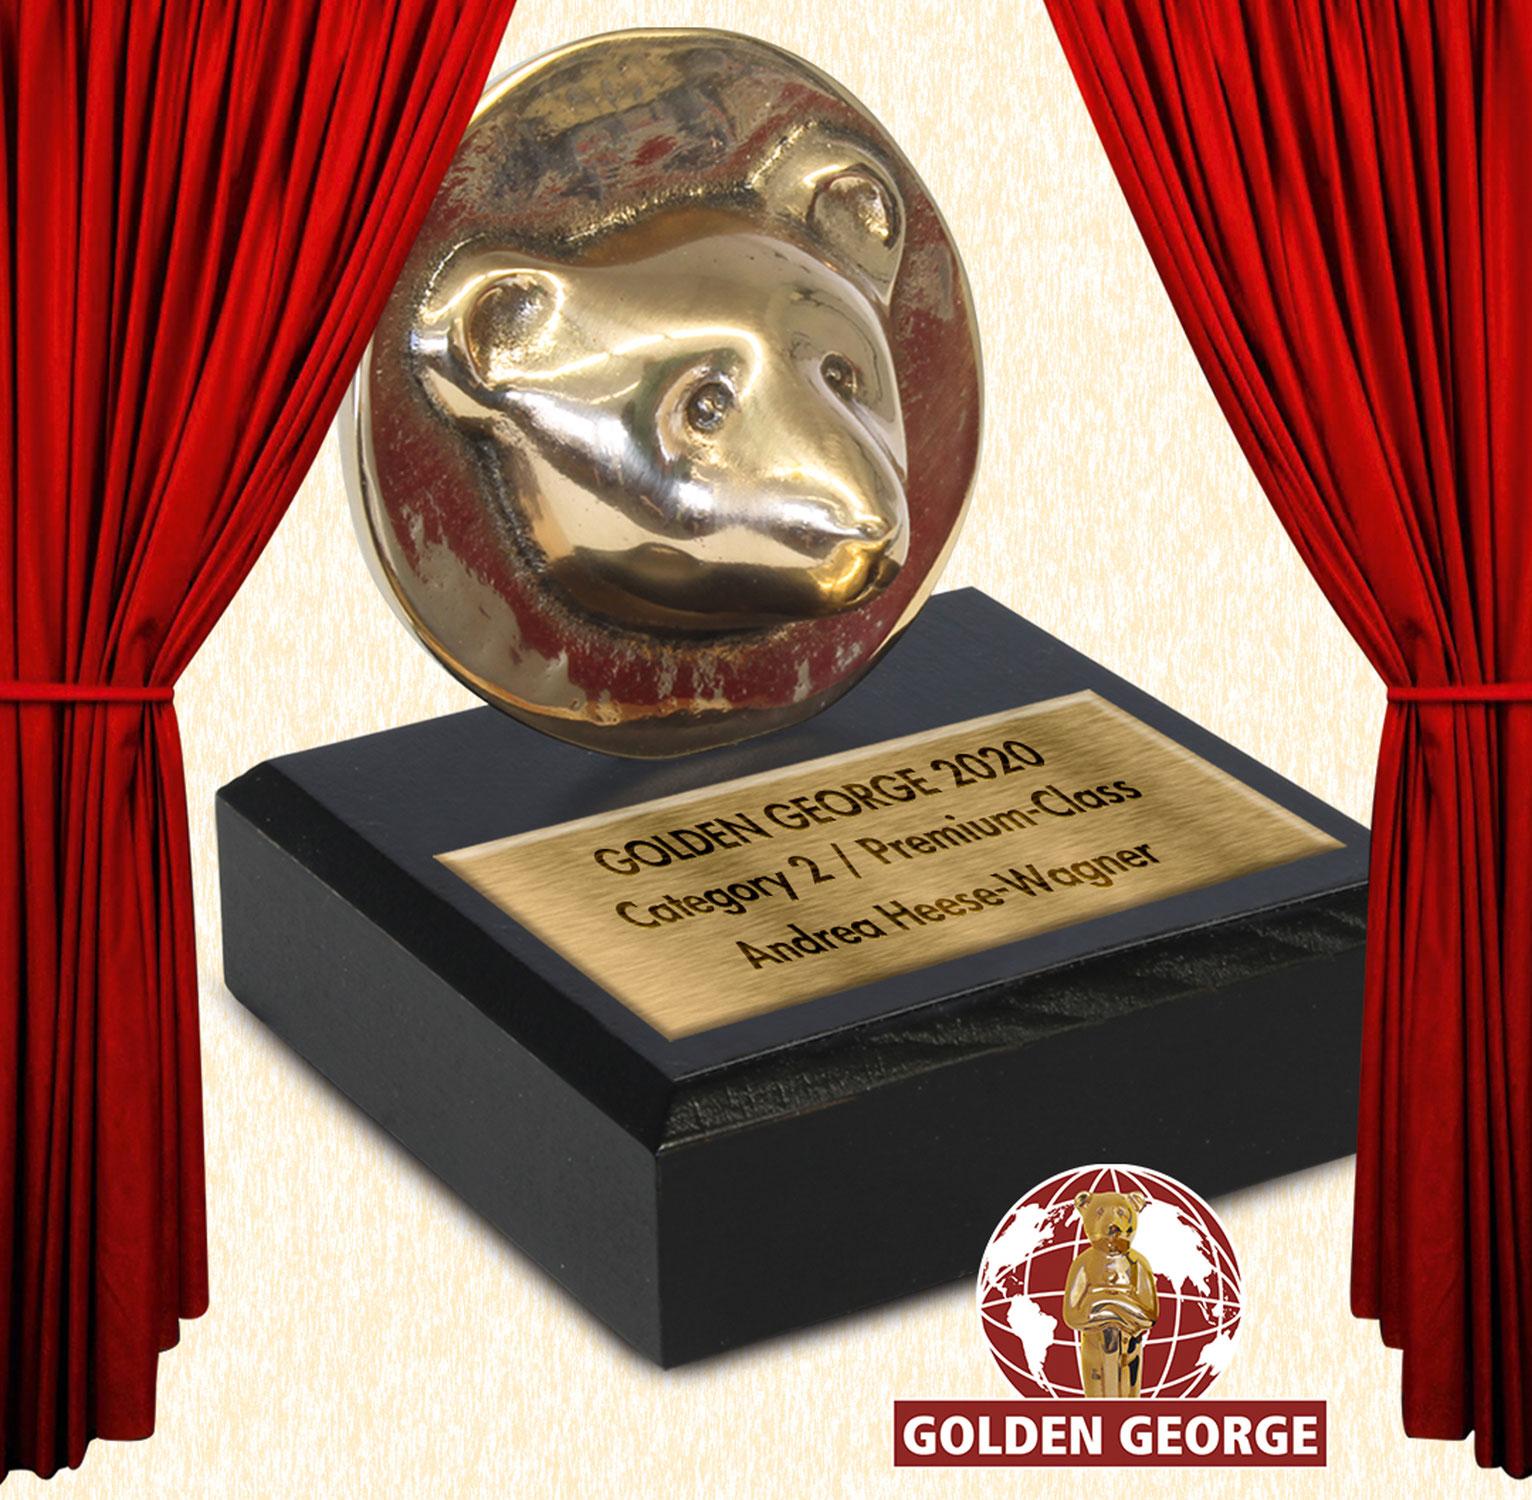 Golden-George 2020